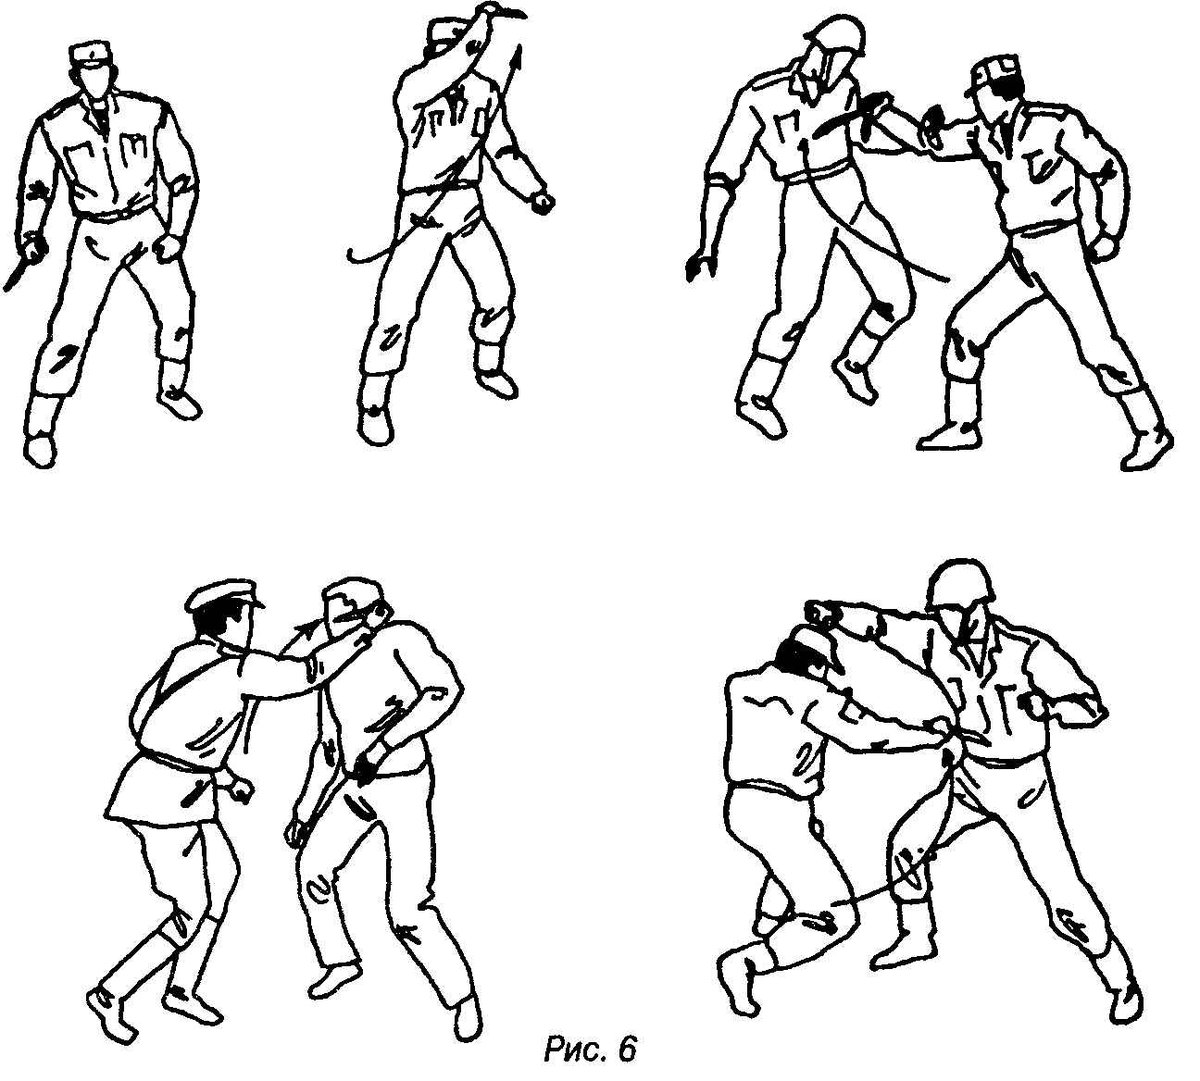 уроки по рукопашному бою в картинках